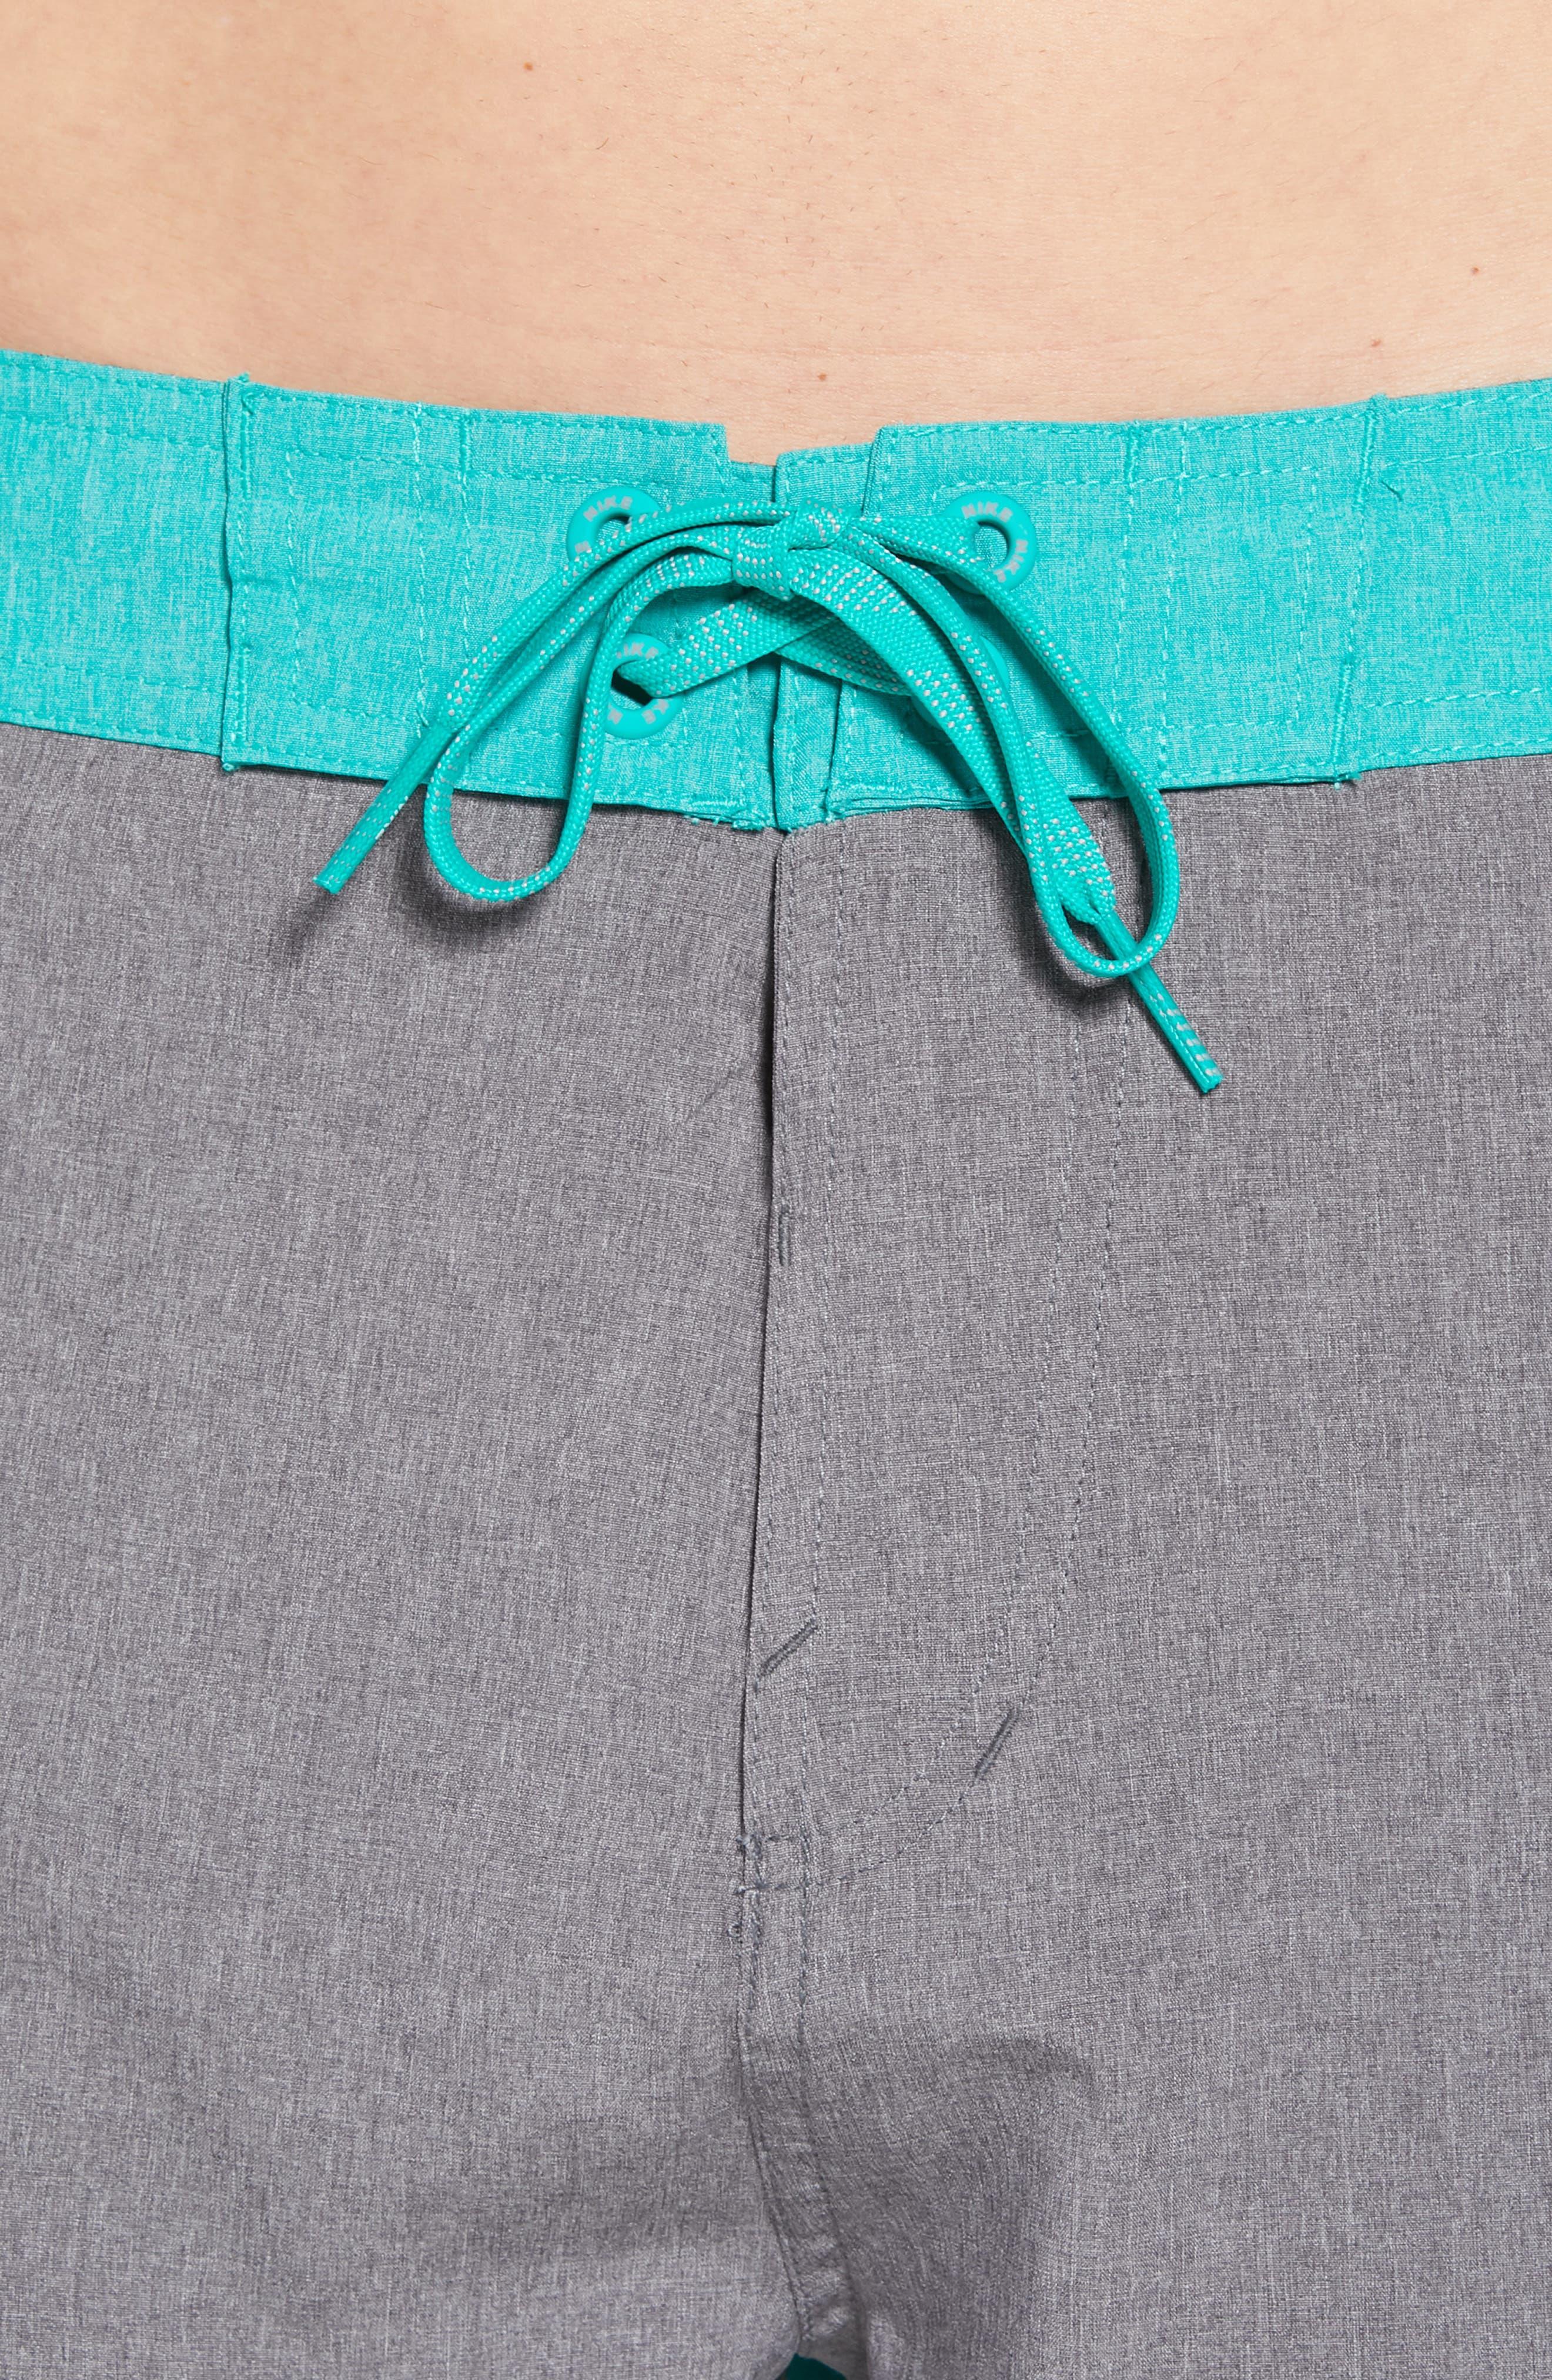 Vortex Board Shorts,                             Alternate thumbnail 3, color,                             Gunsmoke